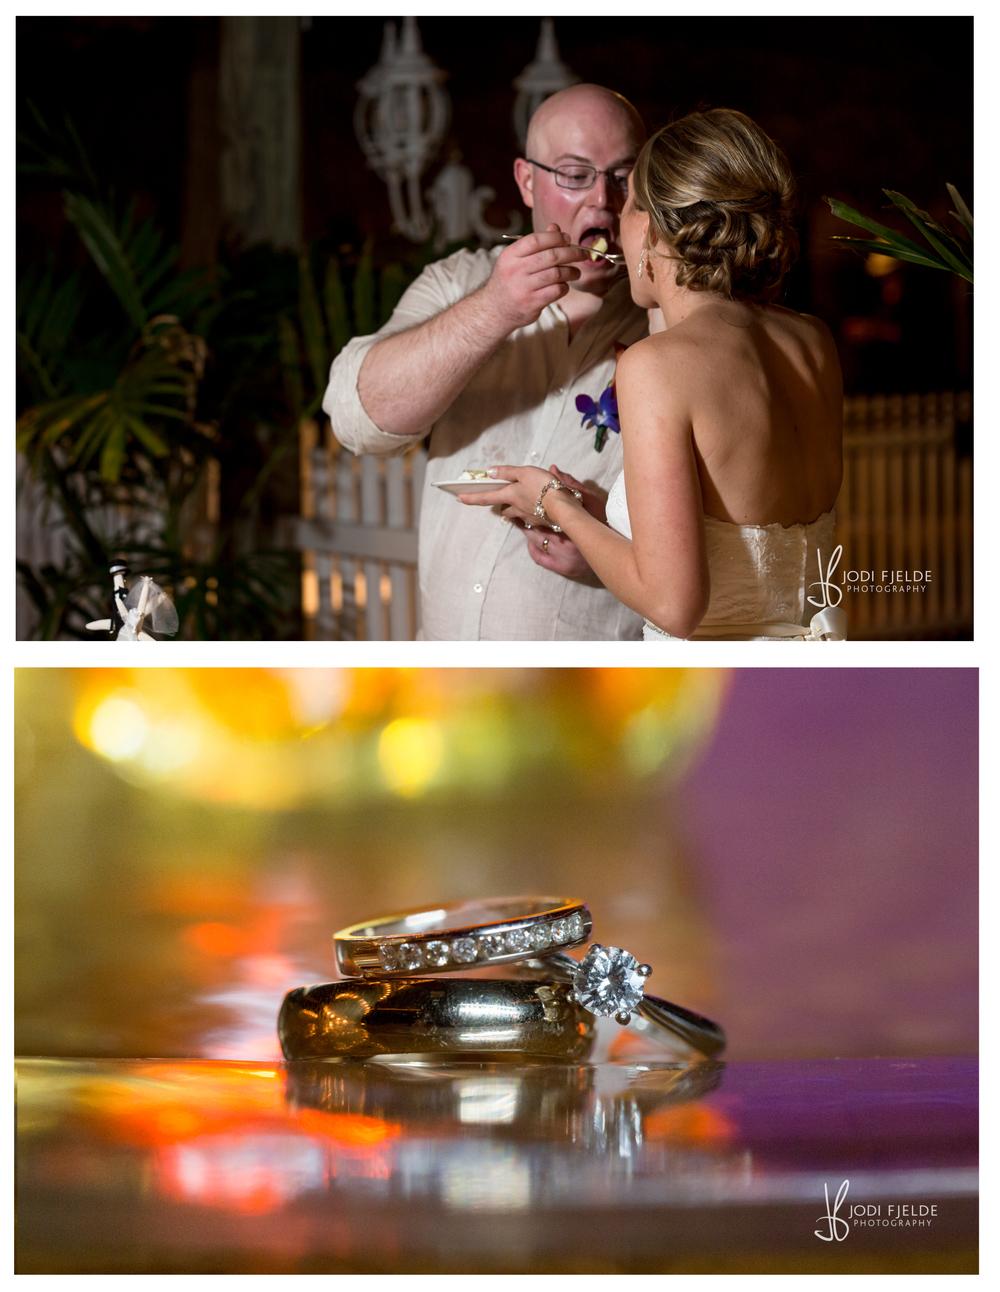 Cocconut_Cove_&_ Marina_ wedding_Kayla_and_Patrick 43.jpg